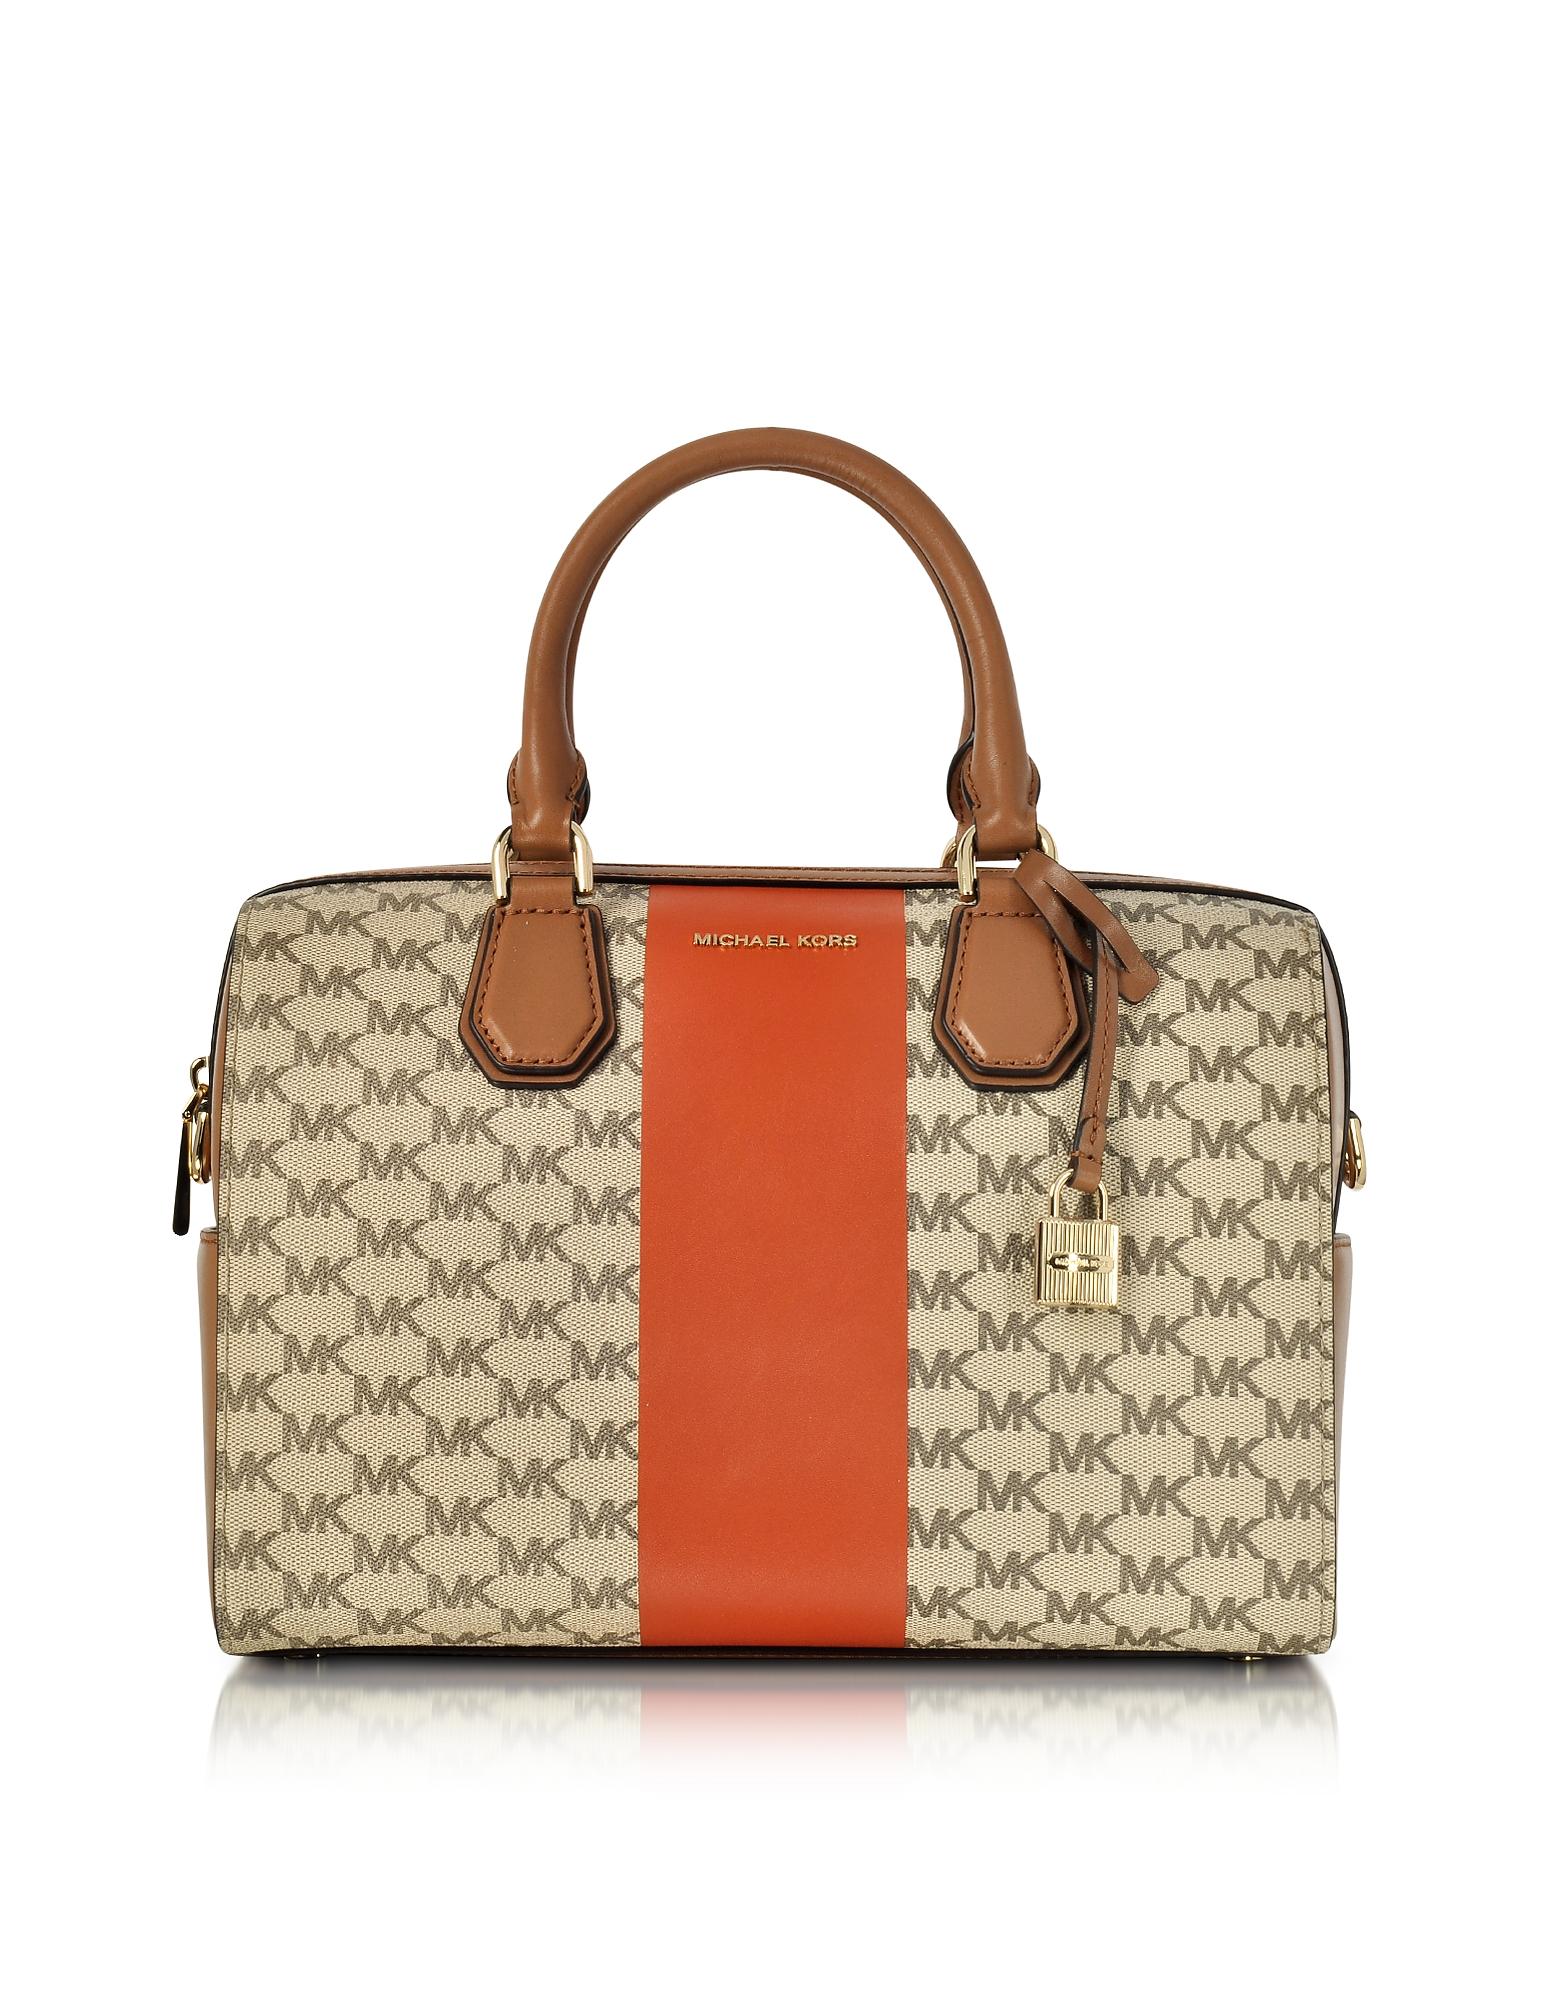 Michael Kors Mercer Medium Center Stripe and Heritage Signature Duffle Bag